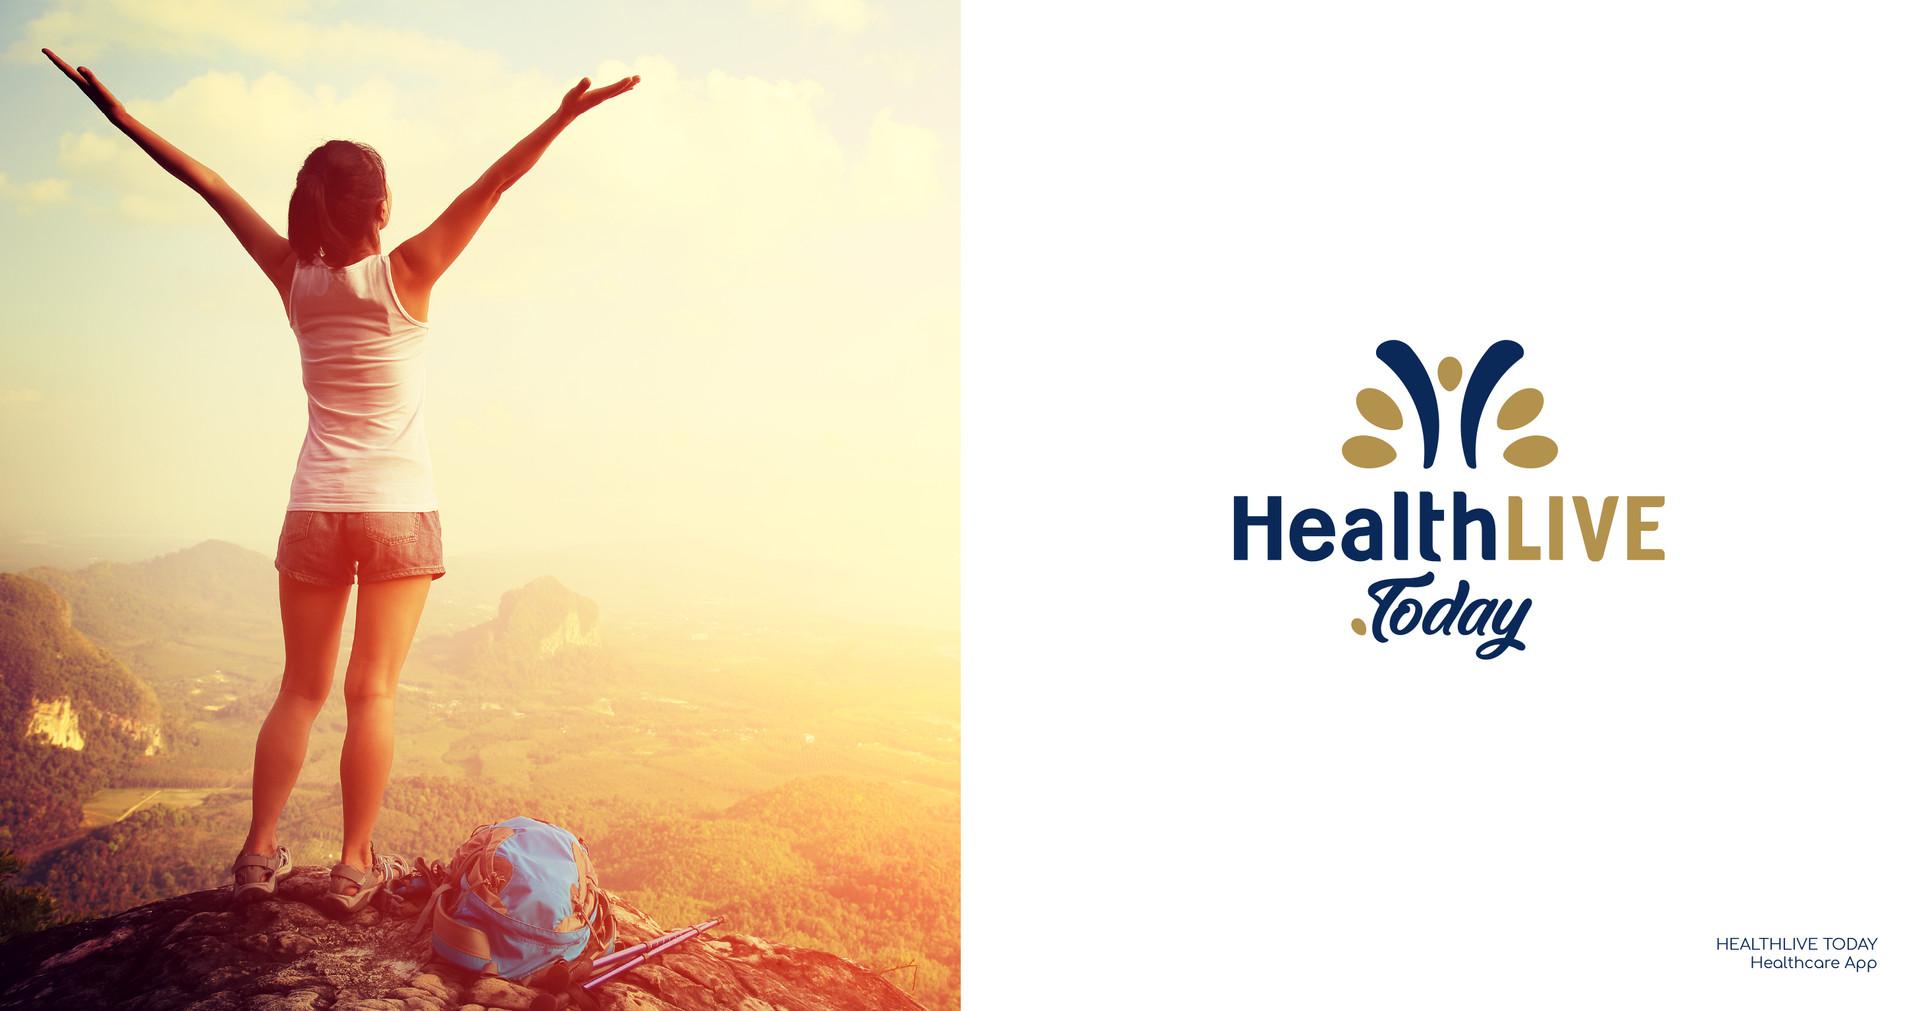 LOGOFOLIO_Healthlive.jpg